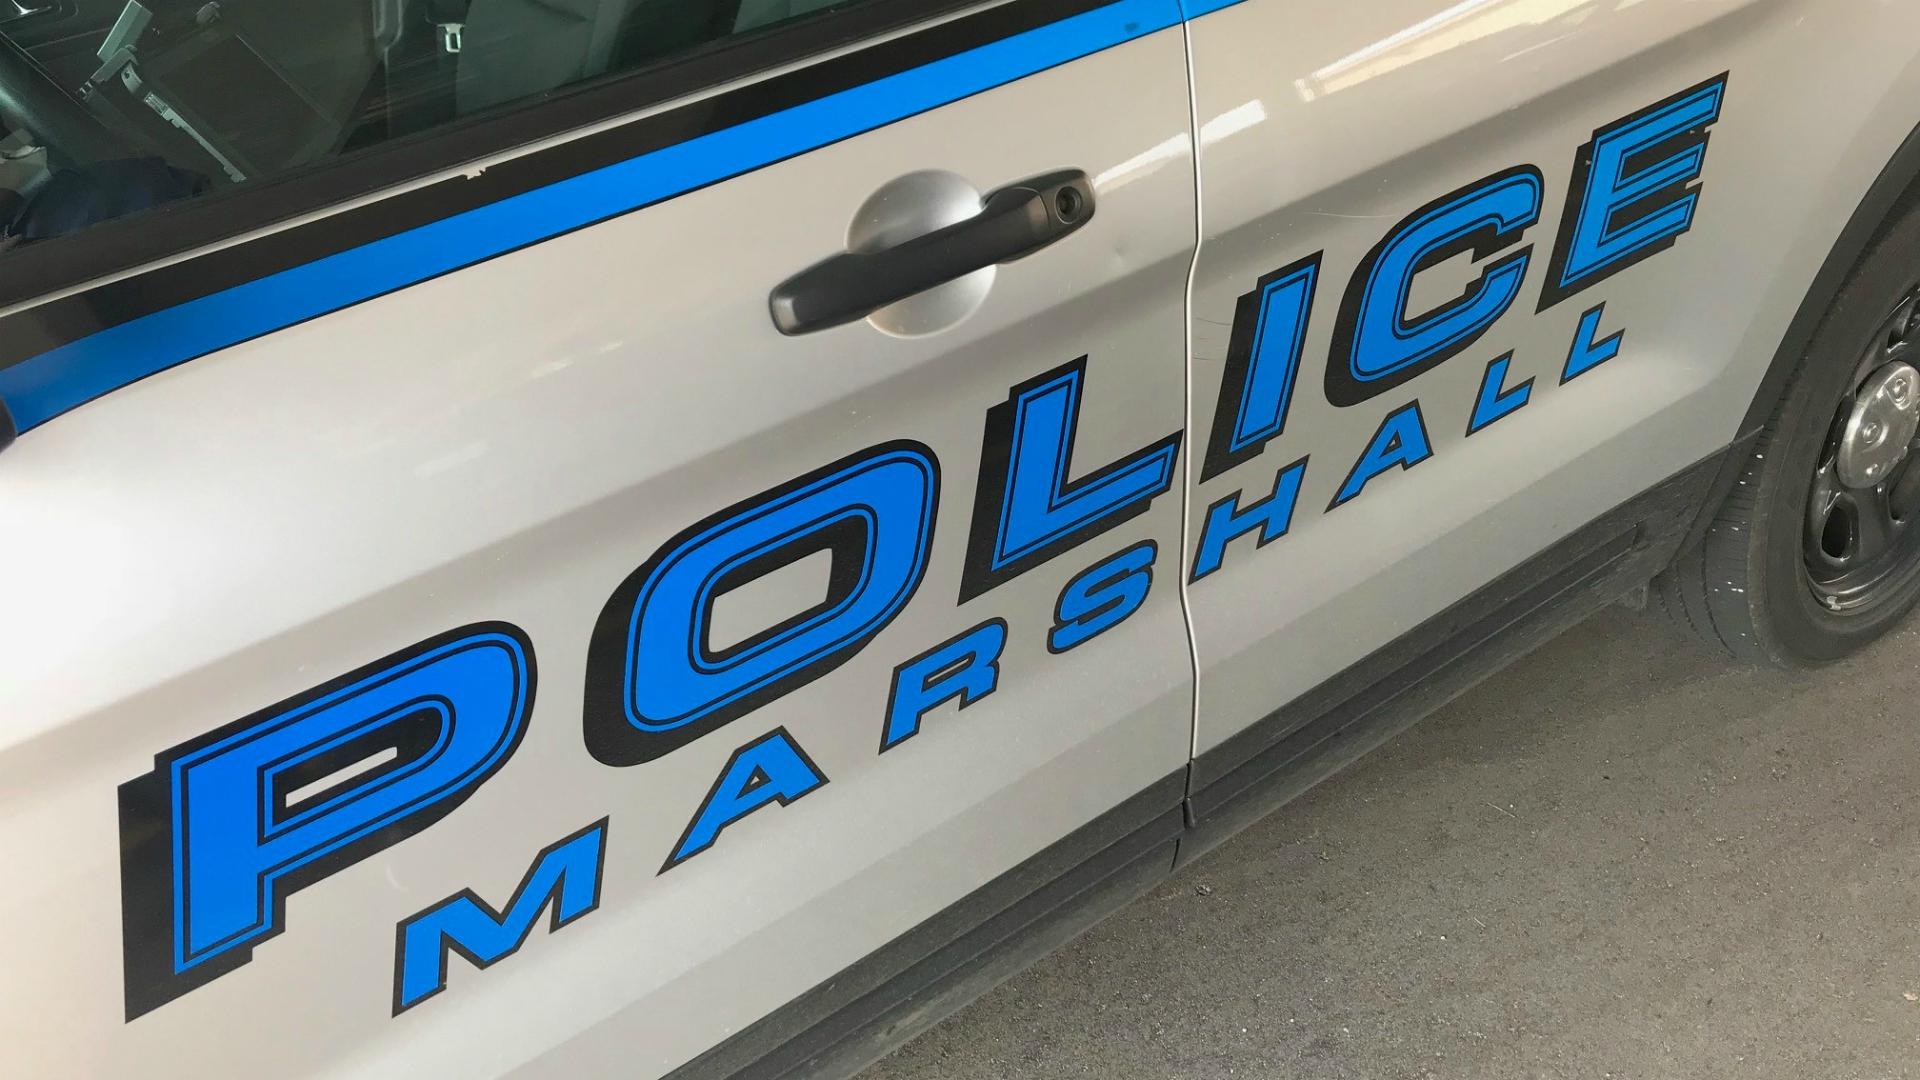 generic marshall police department_1534205990427.jpg